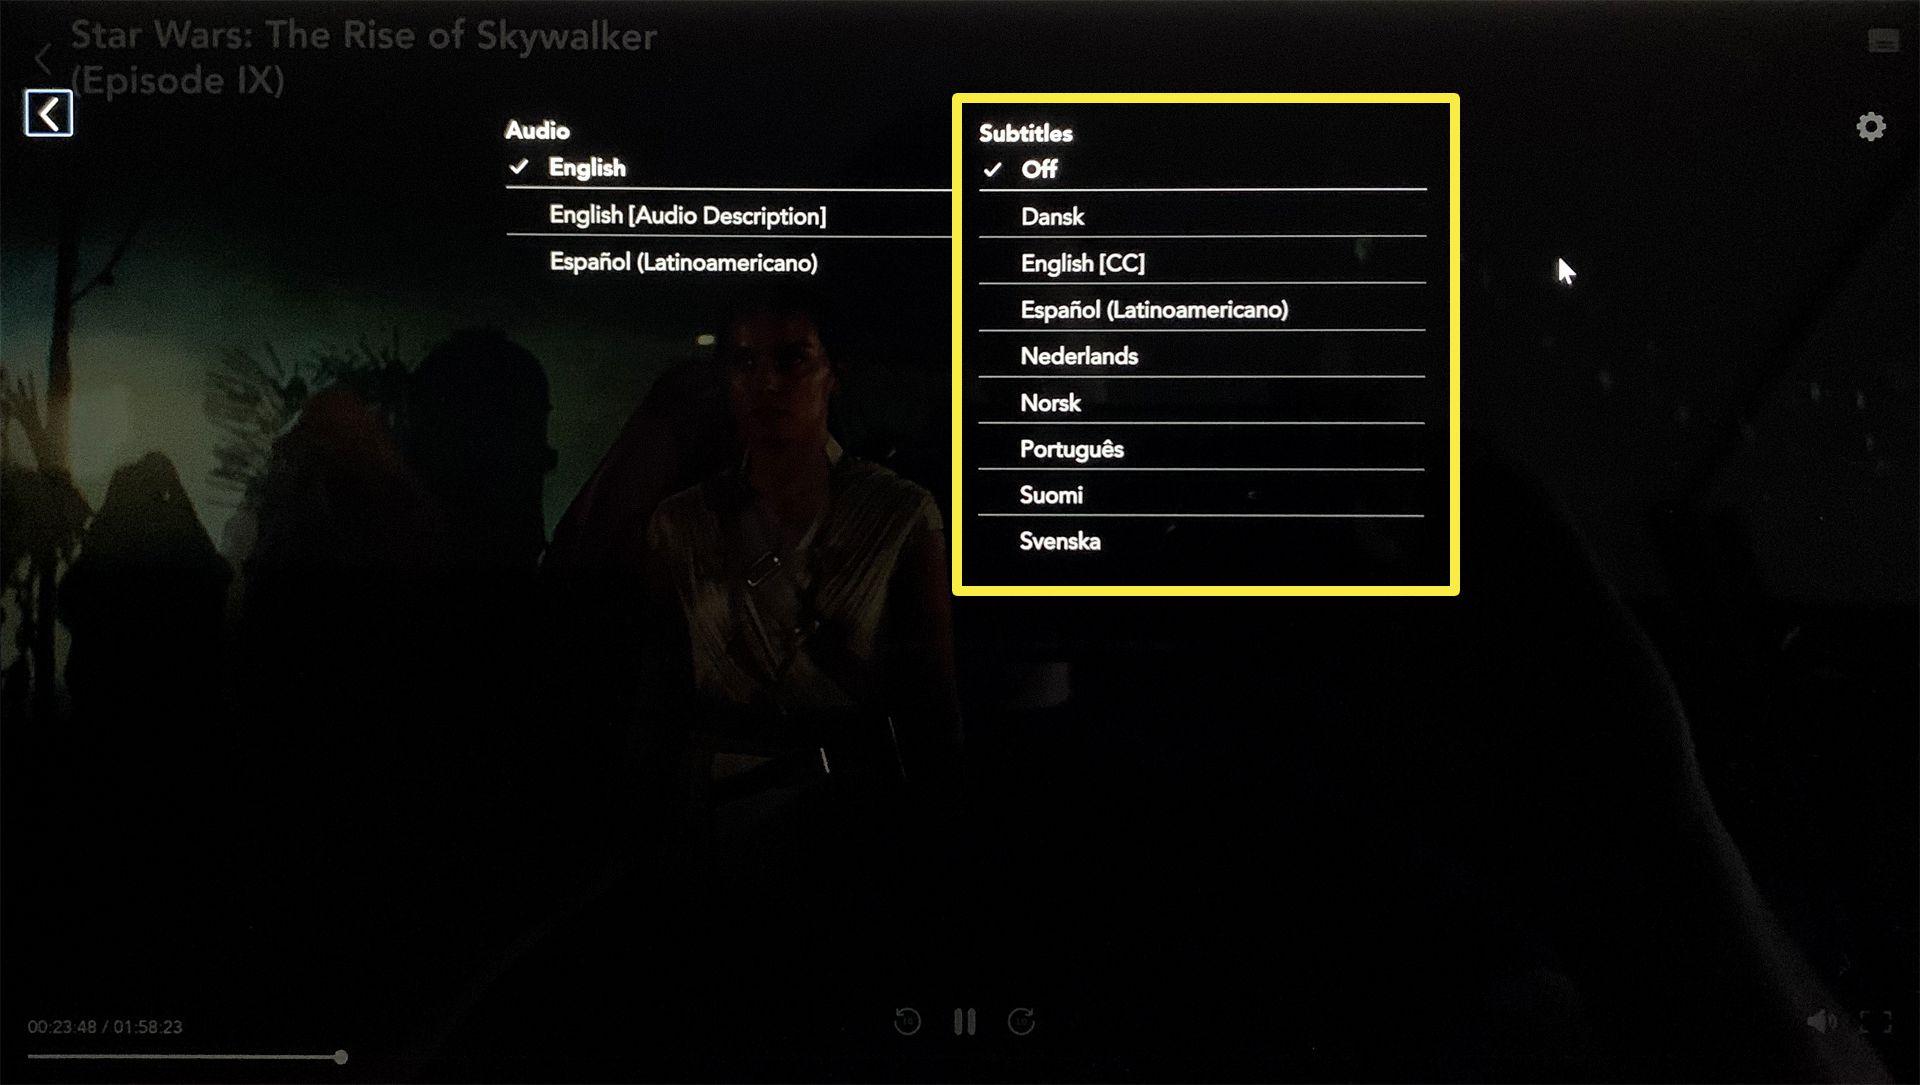 Disney Plus app subtitle settings.